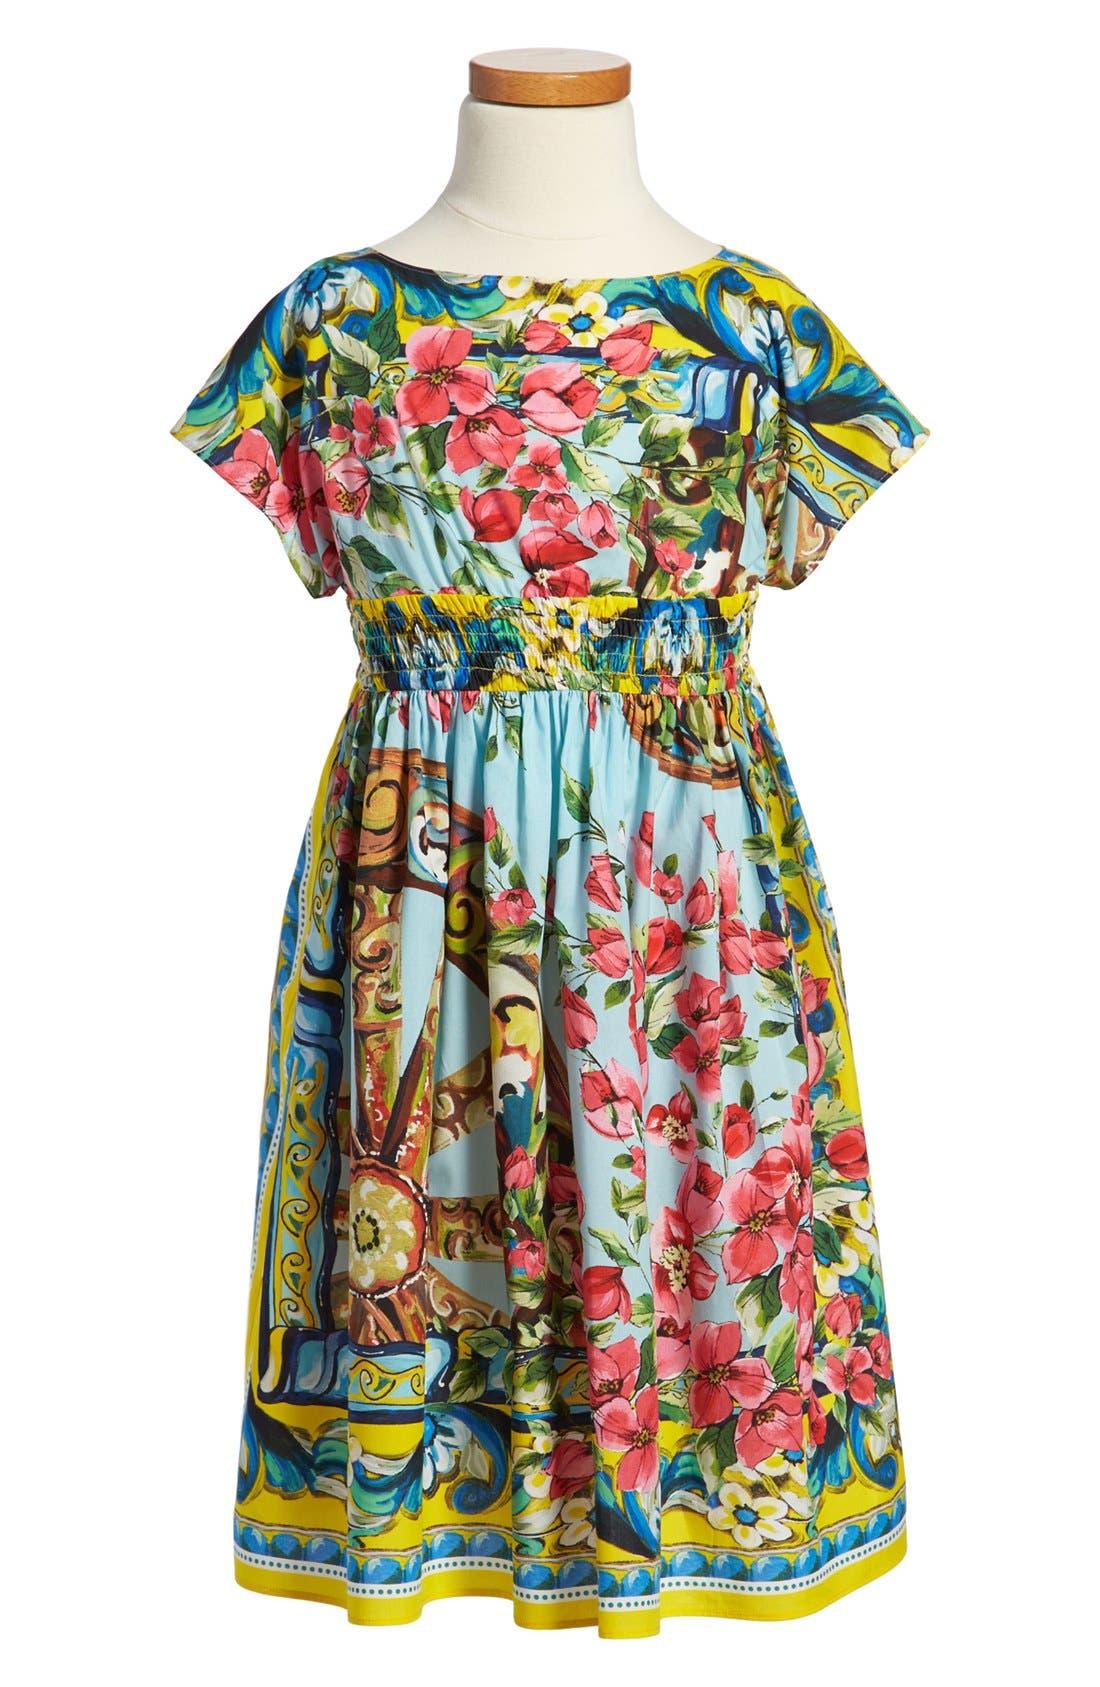 Alternate Image 1 Selected - Dolce&Gabbana Floral Print Poplin Dress (Toddler Girls, Little Girls & Big Girls)